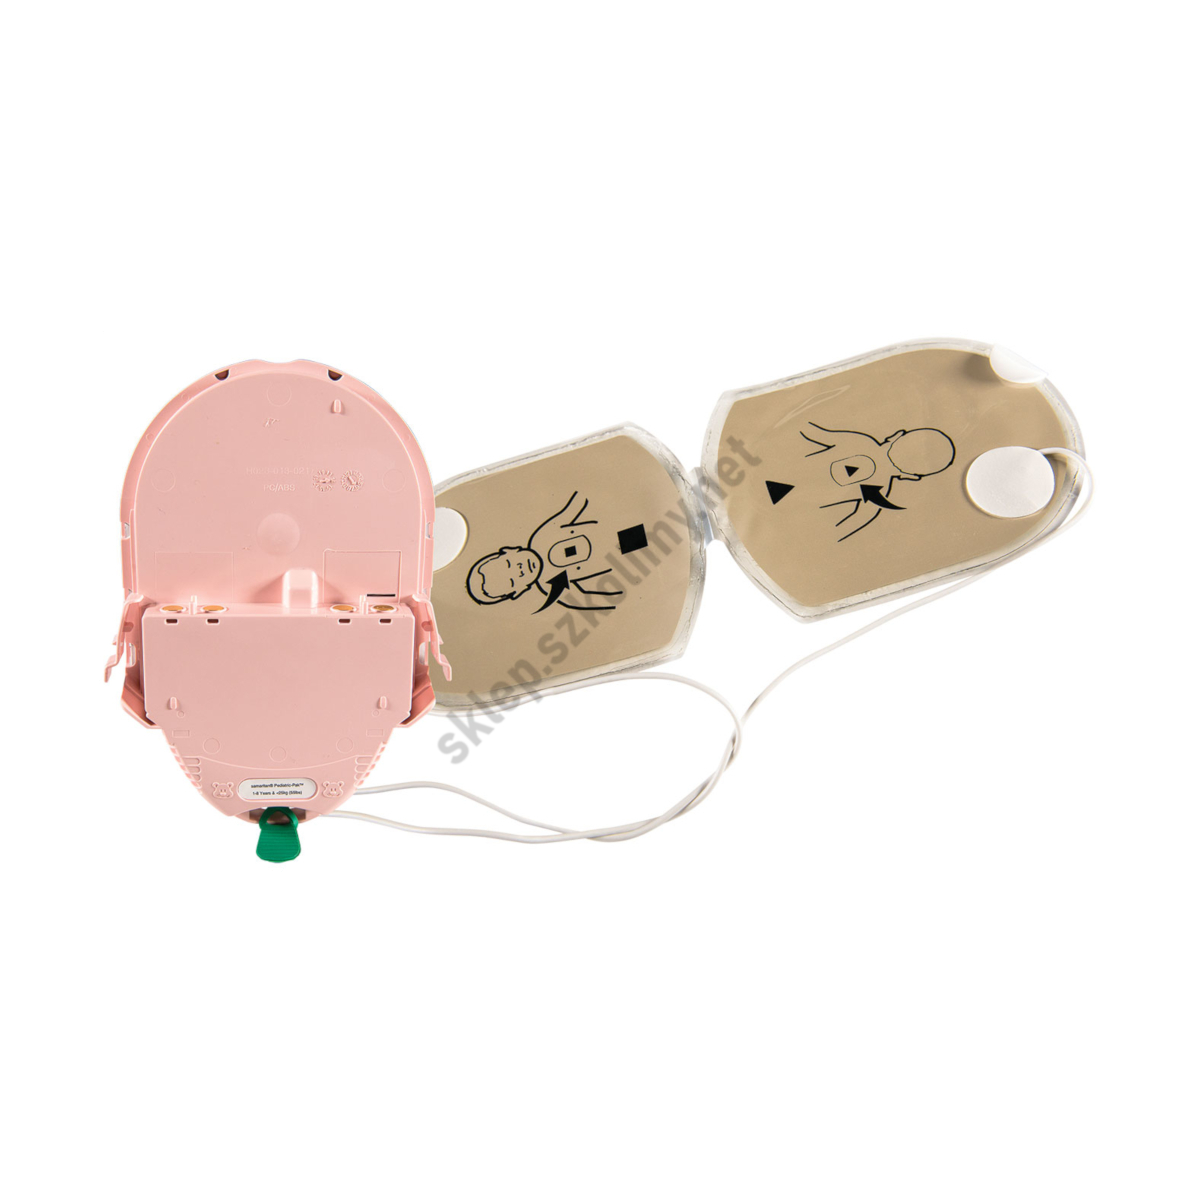 Elektrody-bateria PEDI-PAK do Samaritan PAD dla dzieci